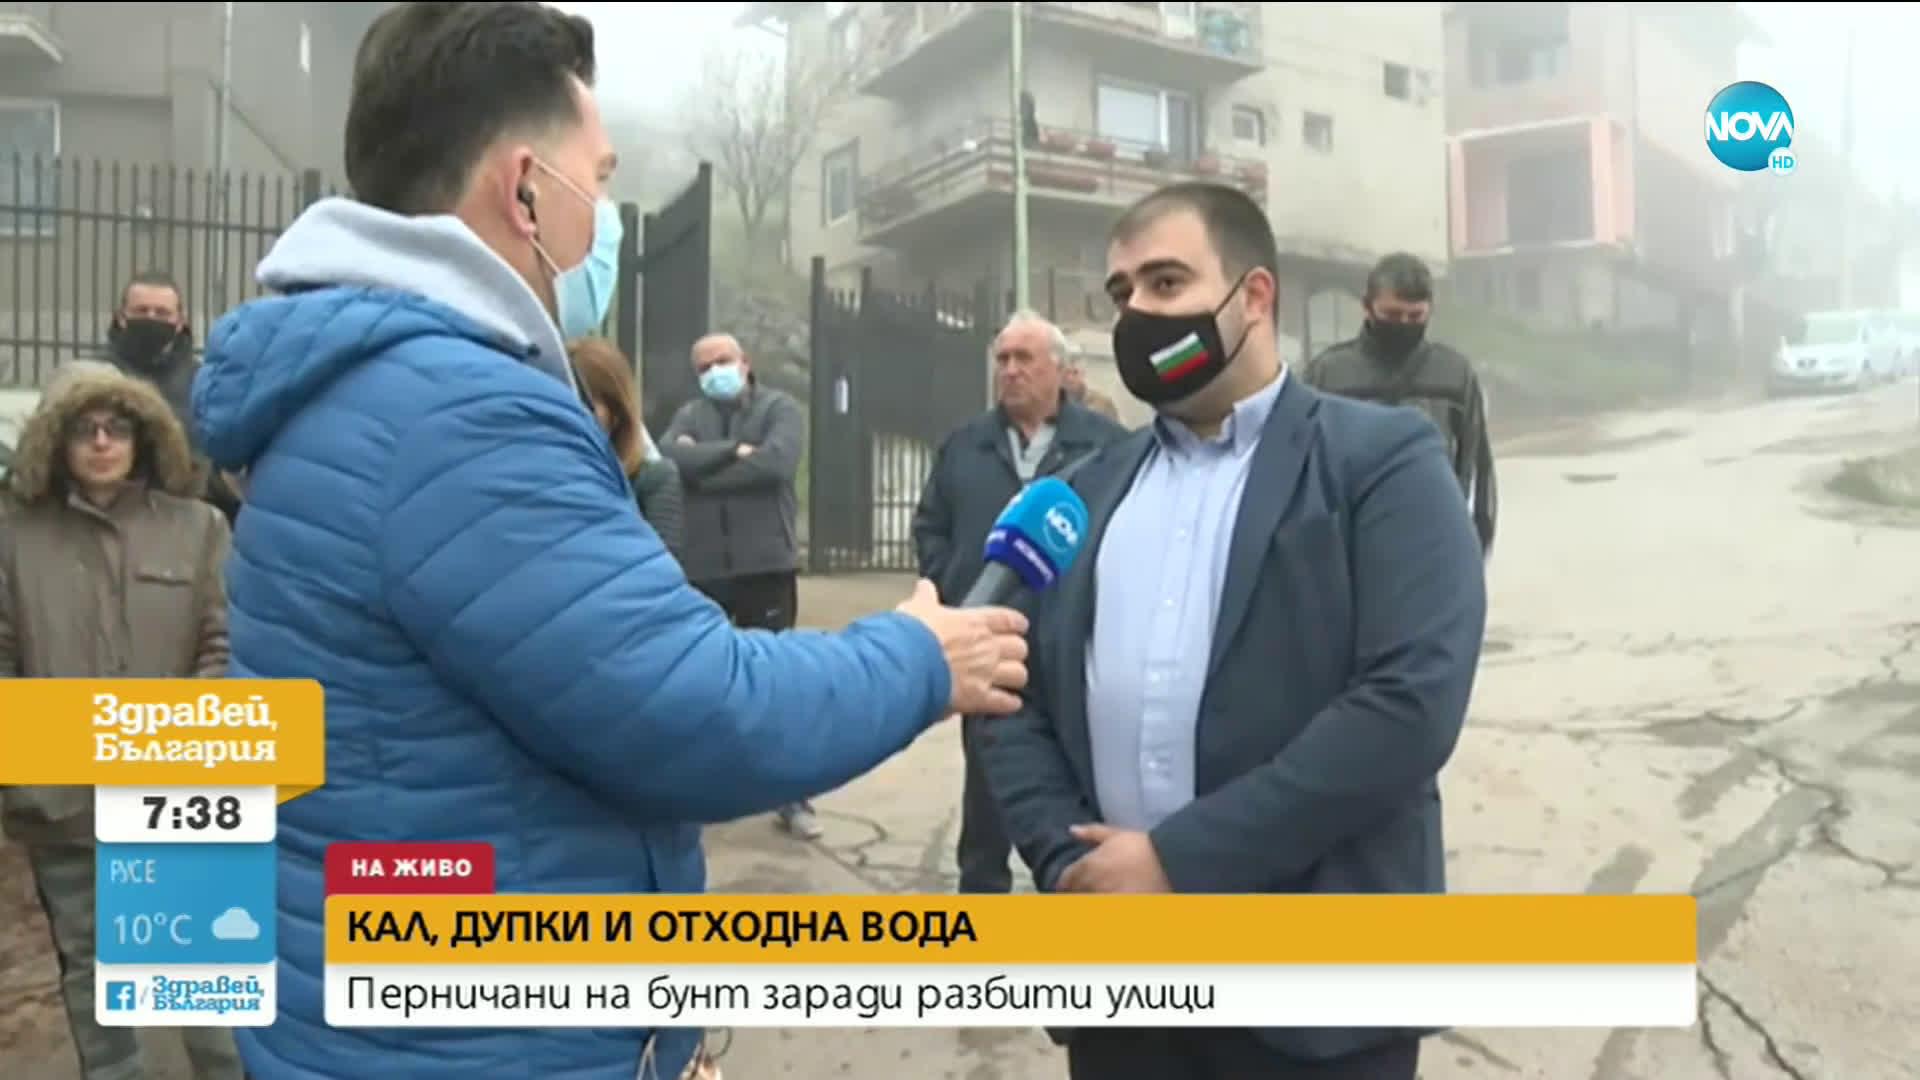 Жители на Перник на бунт заради разбити улици